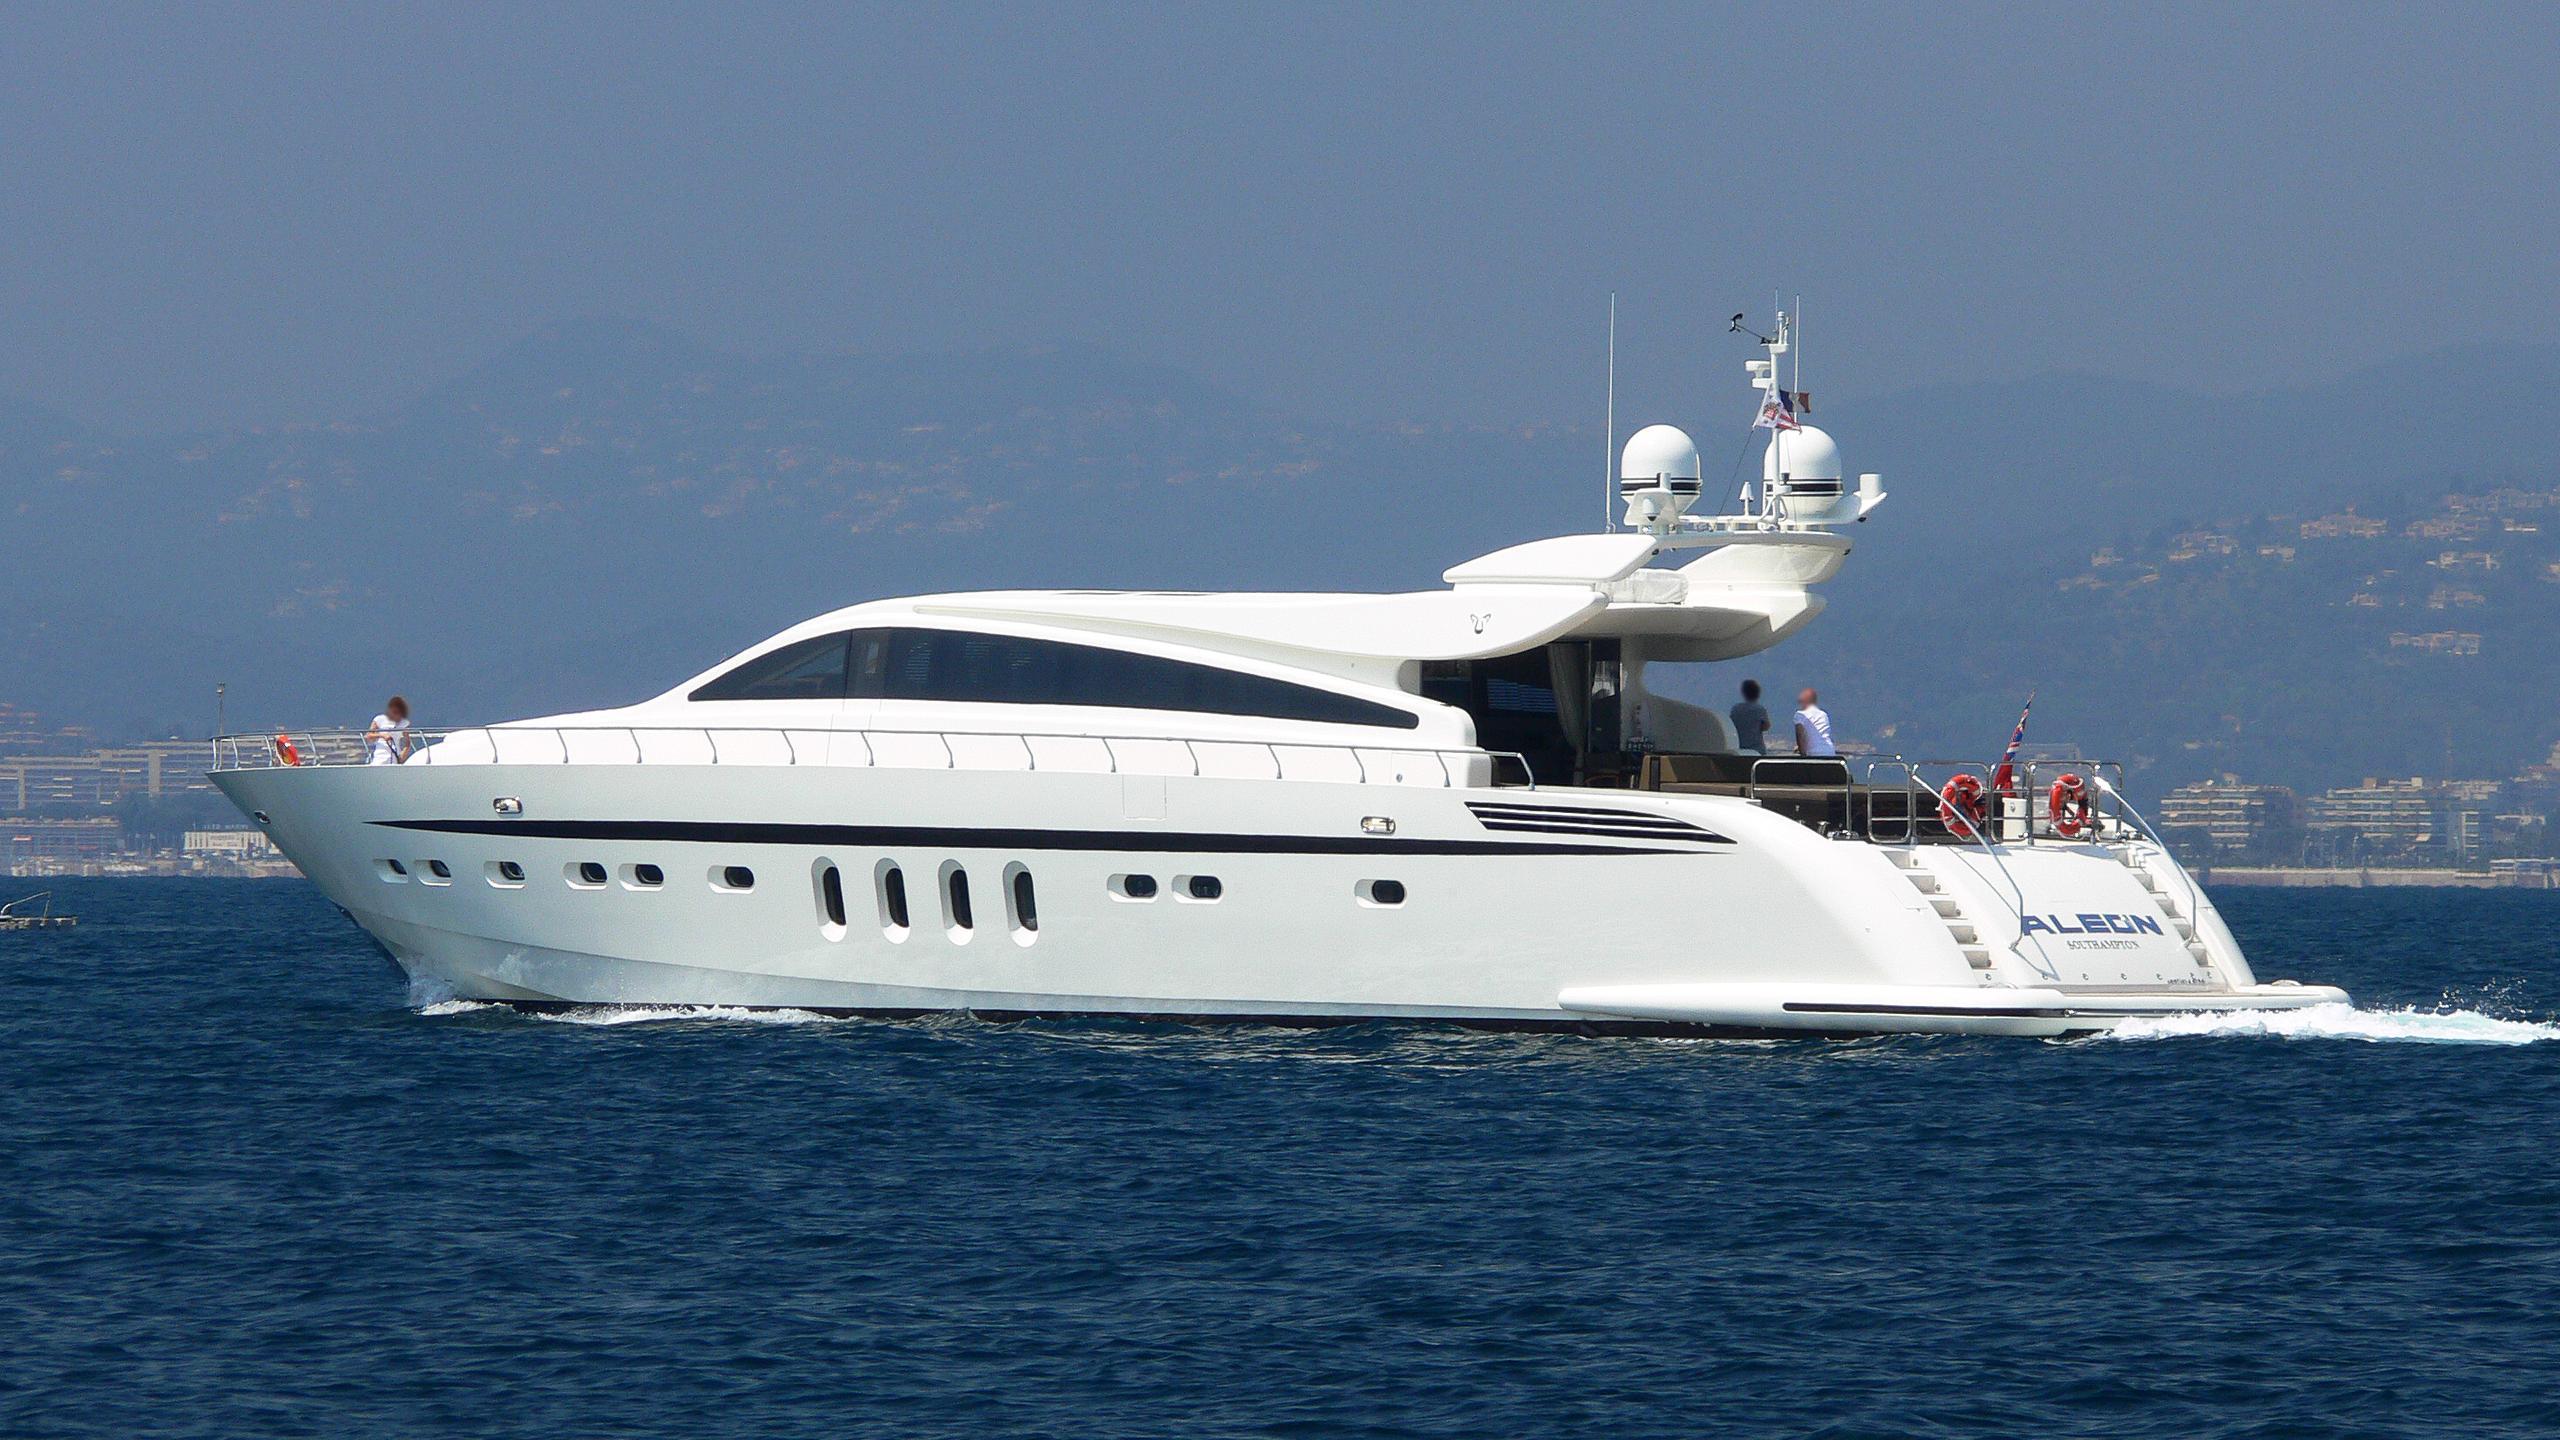 aleon-motor-yacht-arno-leopard-31-sport-2006-31m-half-profile-cruising